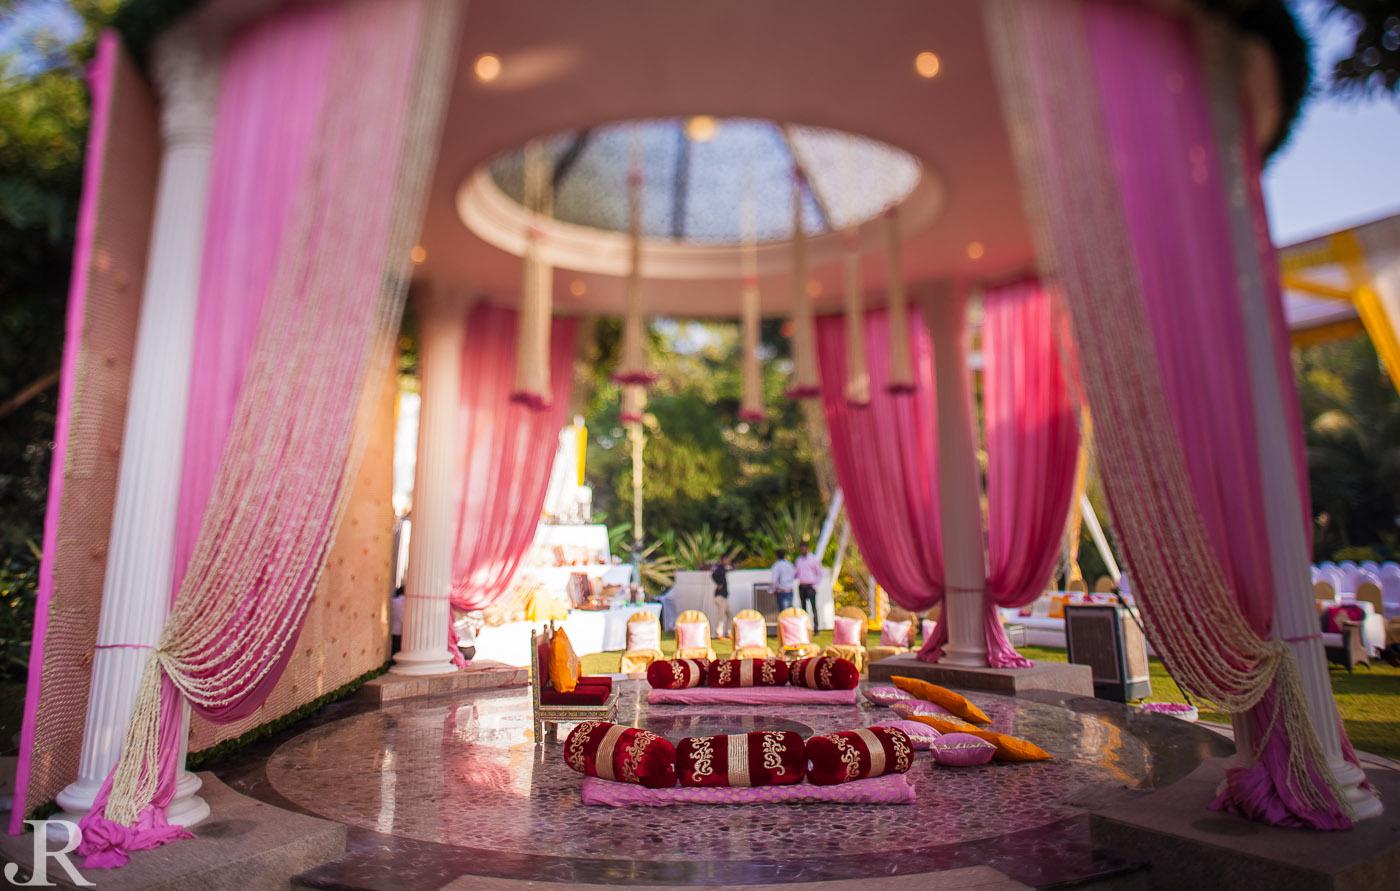 Vendor Feature The Wedding Design Company Thedelhibride An Indian Wedding Blog